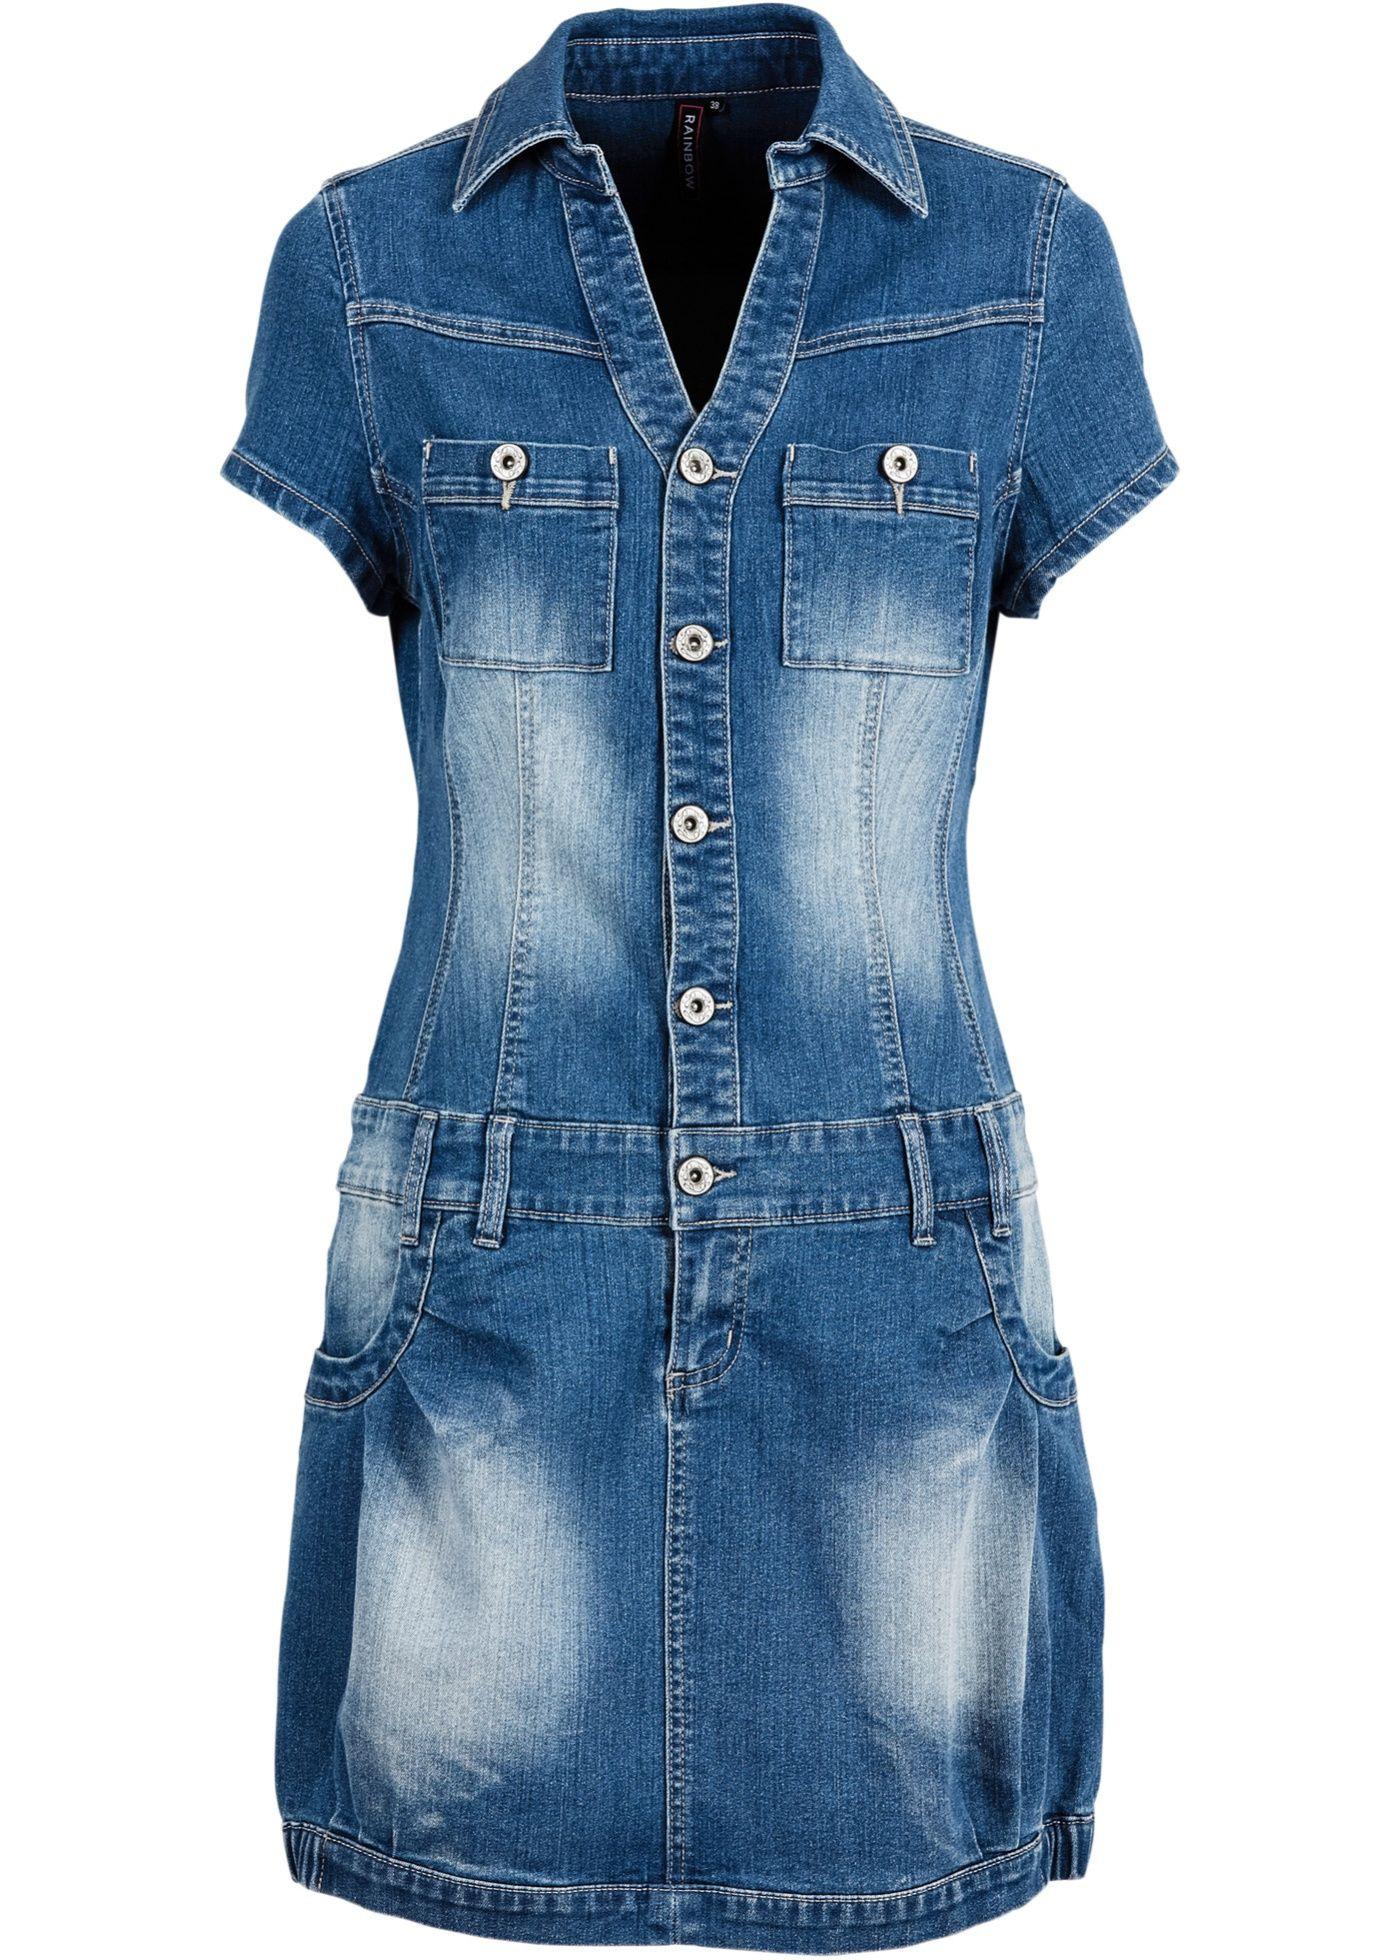 Jeanskleid Aus Nachhaltiger Produktion  Jeans Kleid